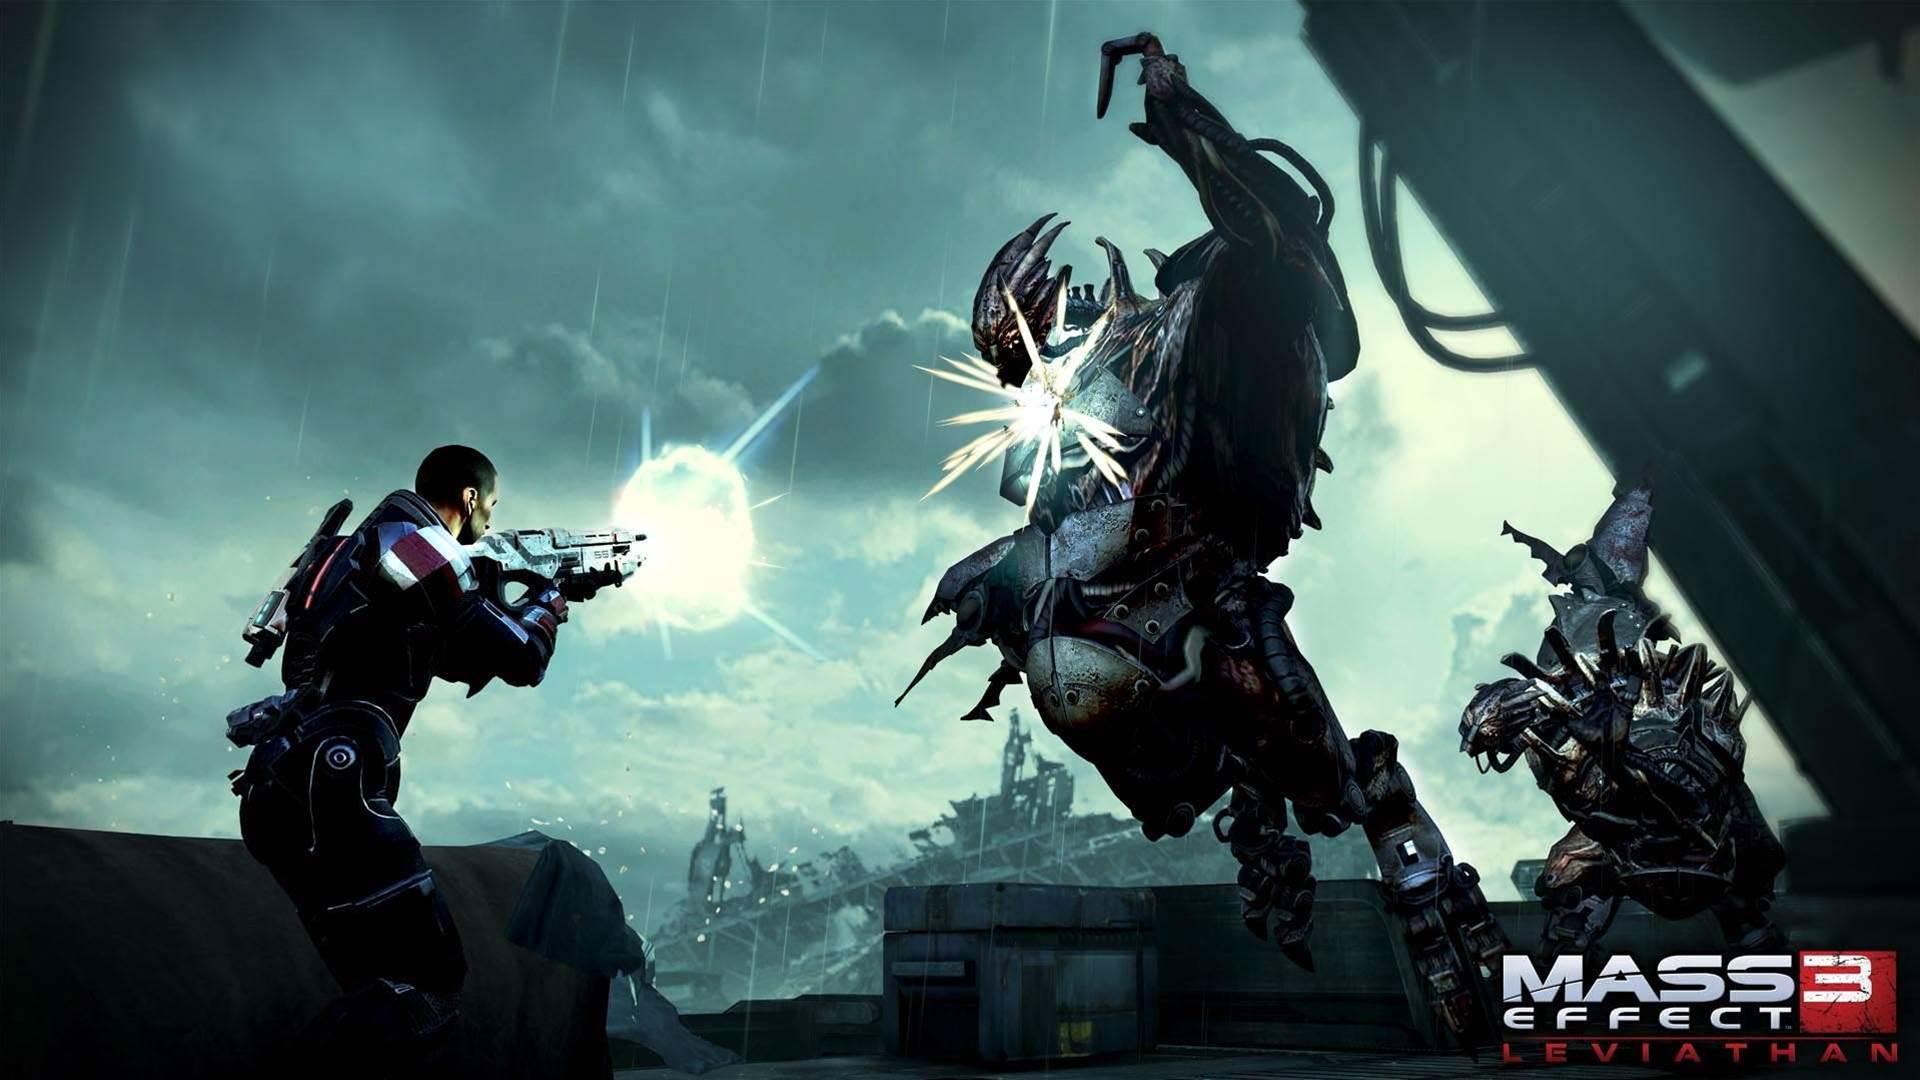 Mass Effect 3: Leviathan DLC out now